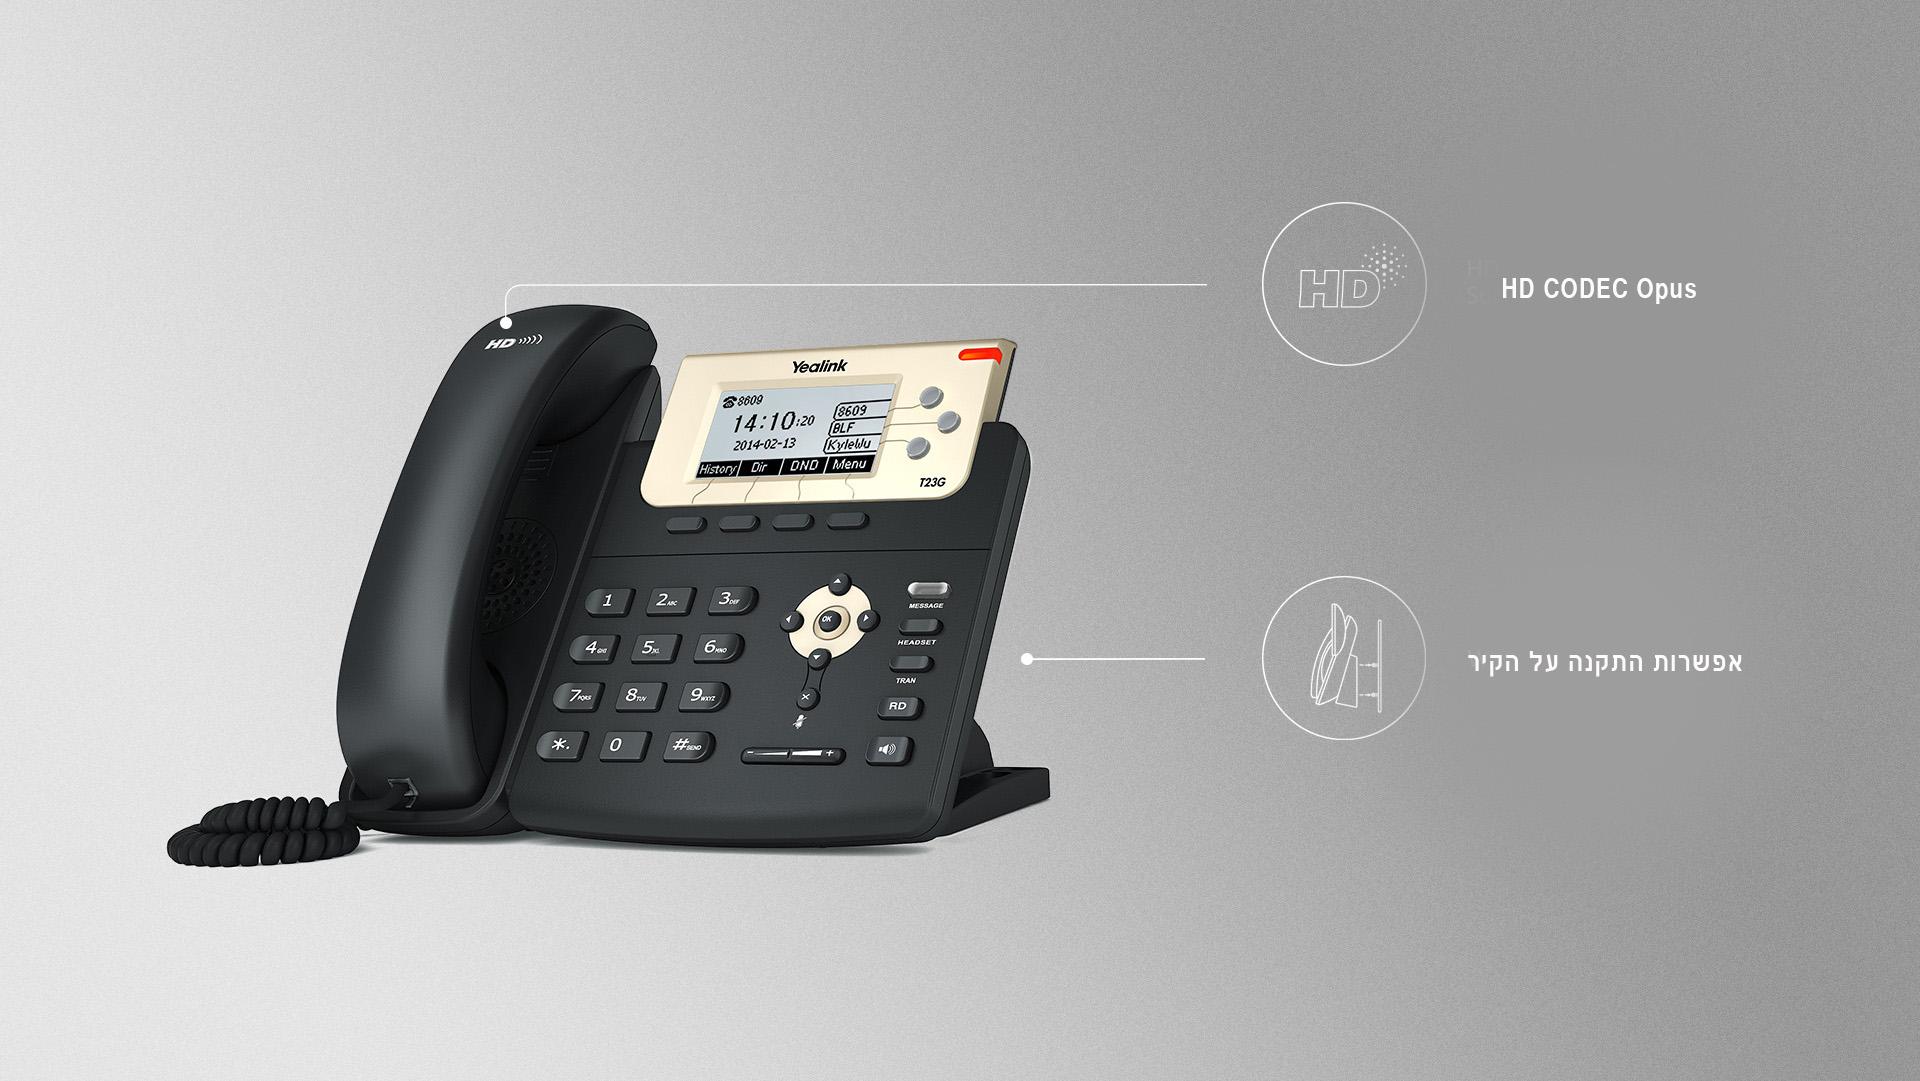 T23G טלפון IP יאלינק איכותי Yealink ergocom